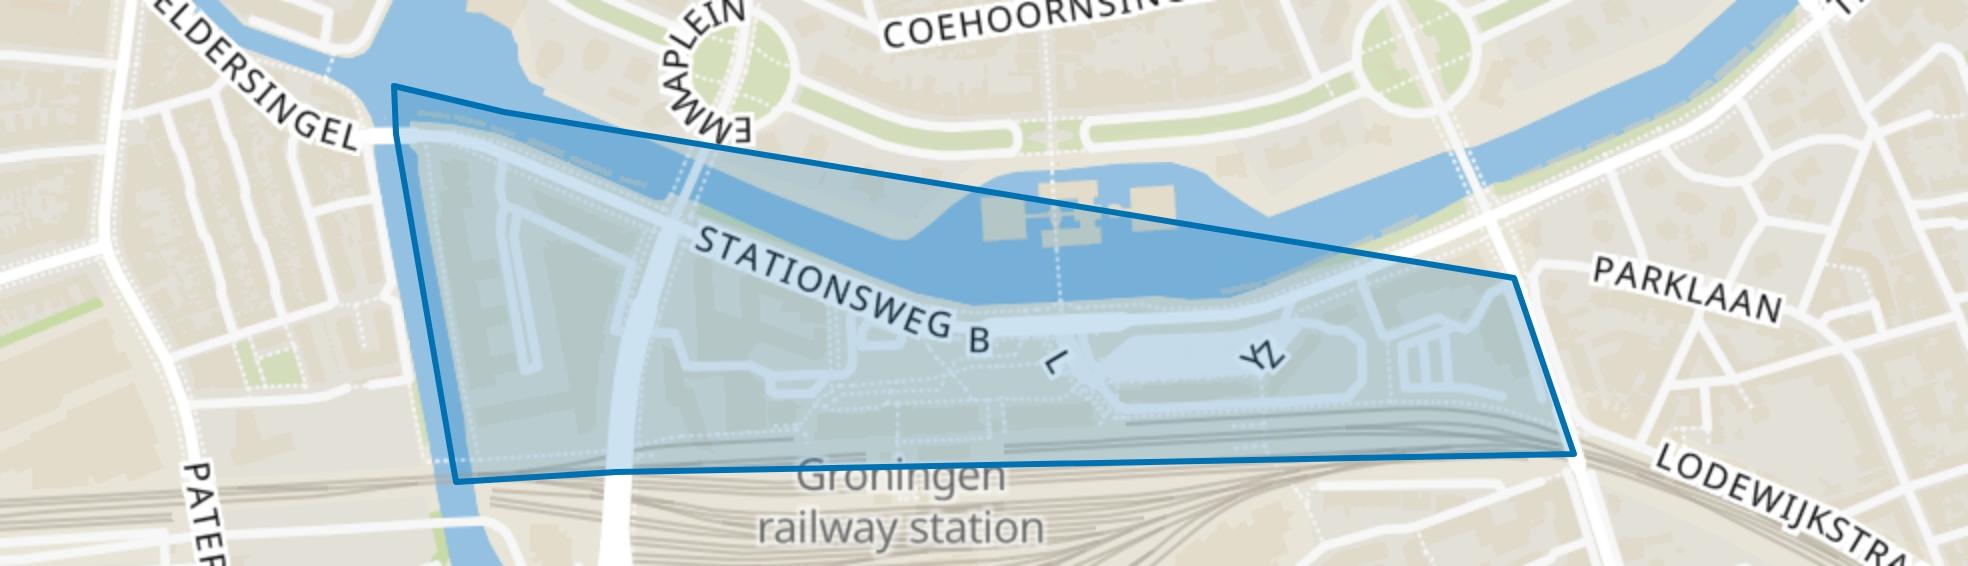 Stationsgebied, Groningen map